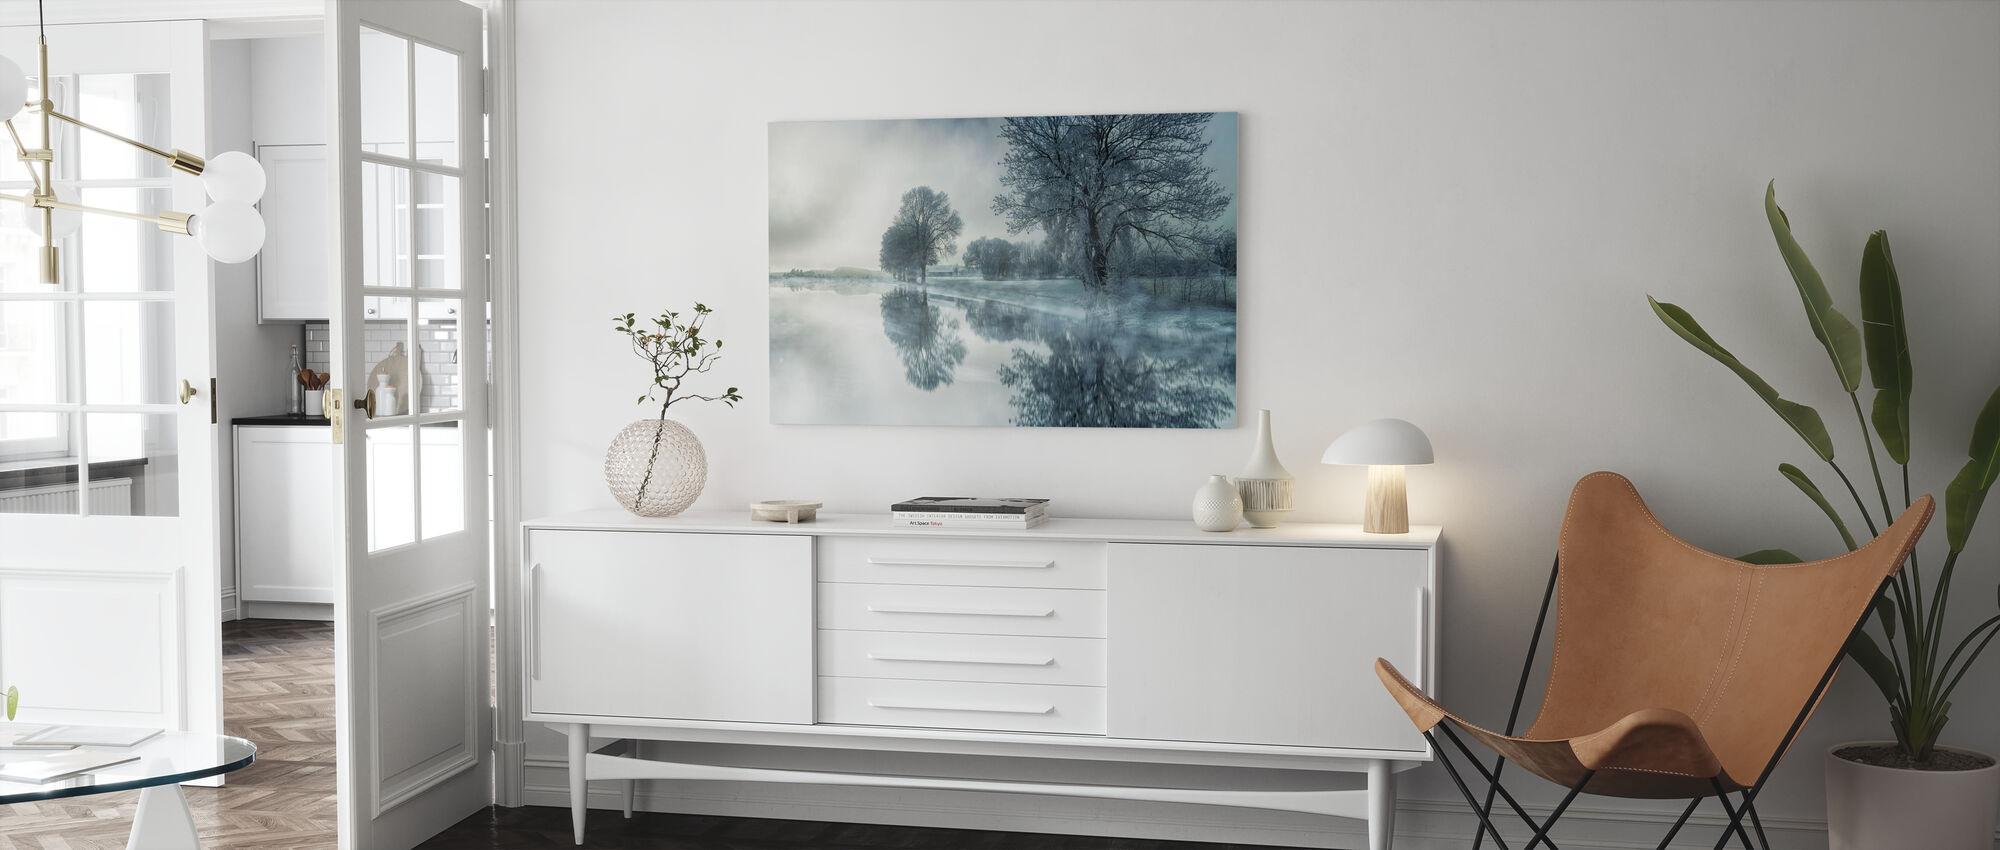 Mirror järvi - Canvastaulu - Olohuone